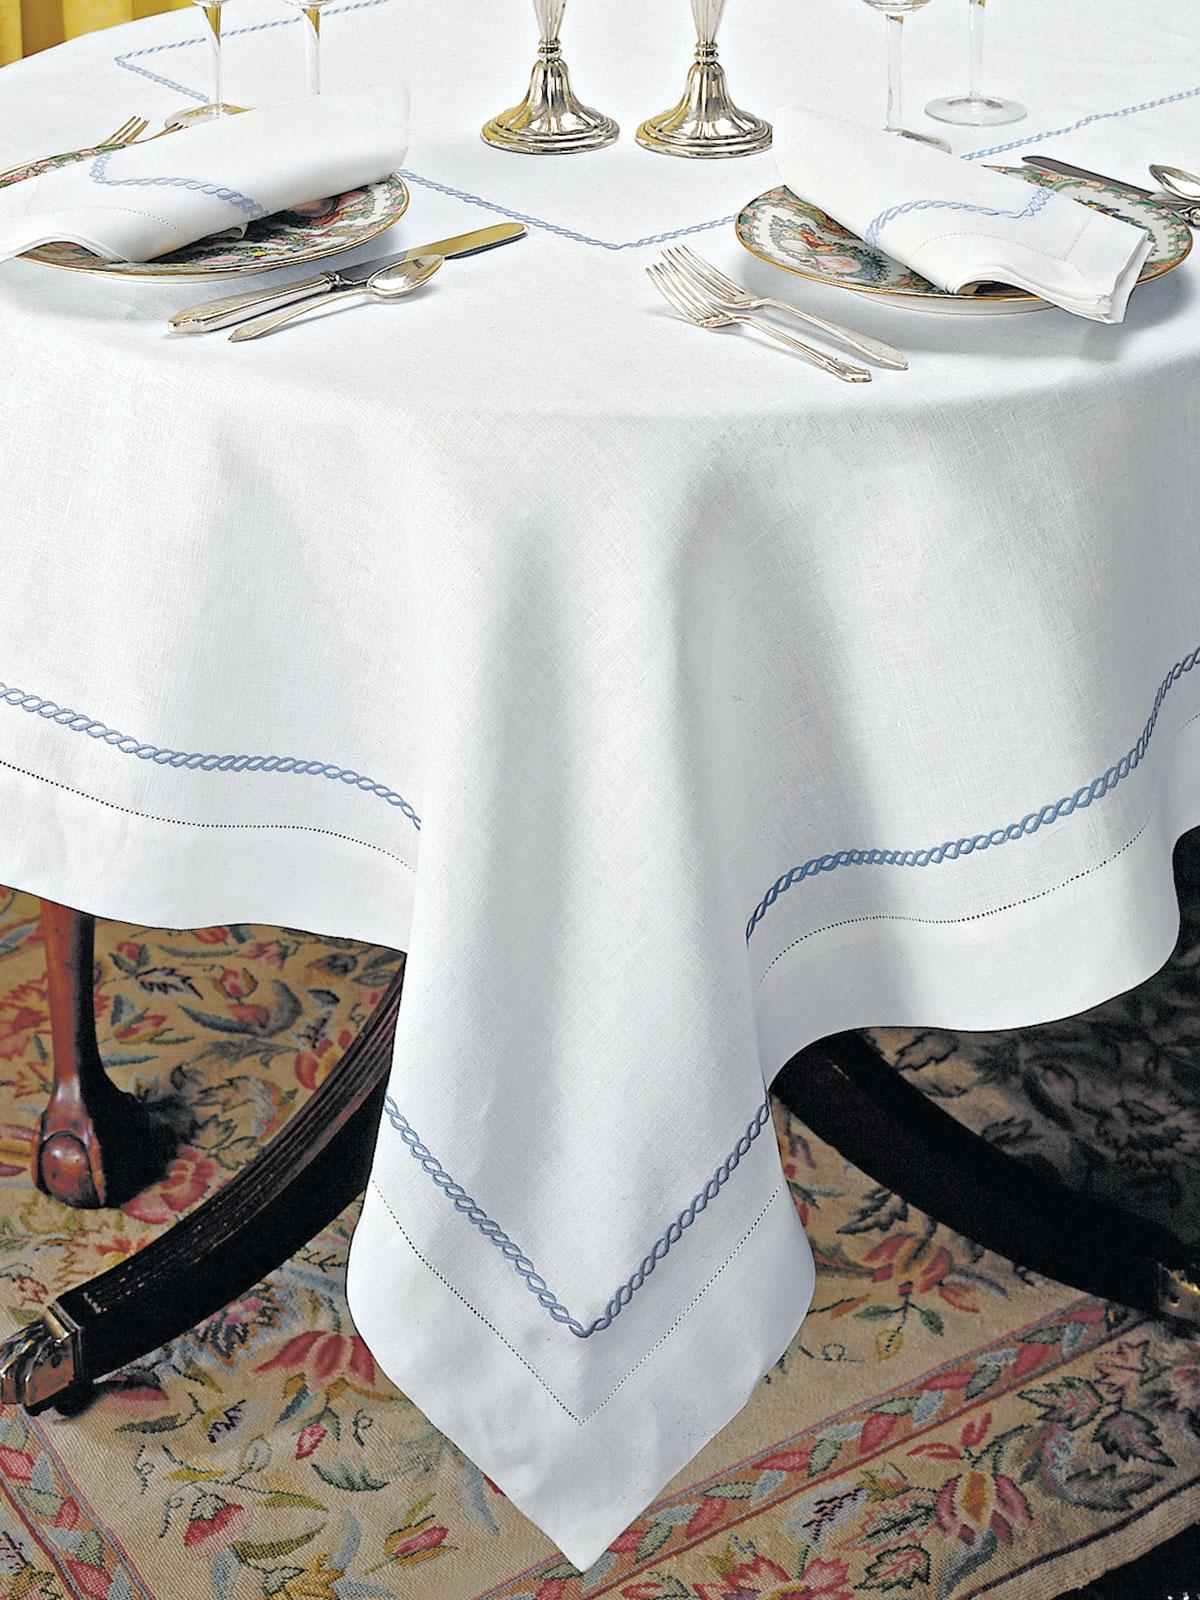 Sienne Scallops Too  Fine Table Linens  Schweitzer Linen